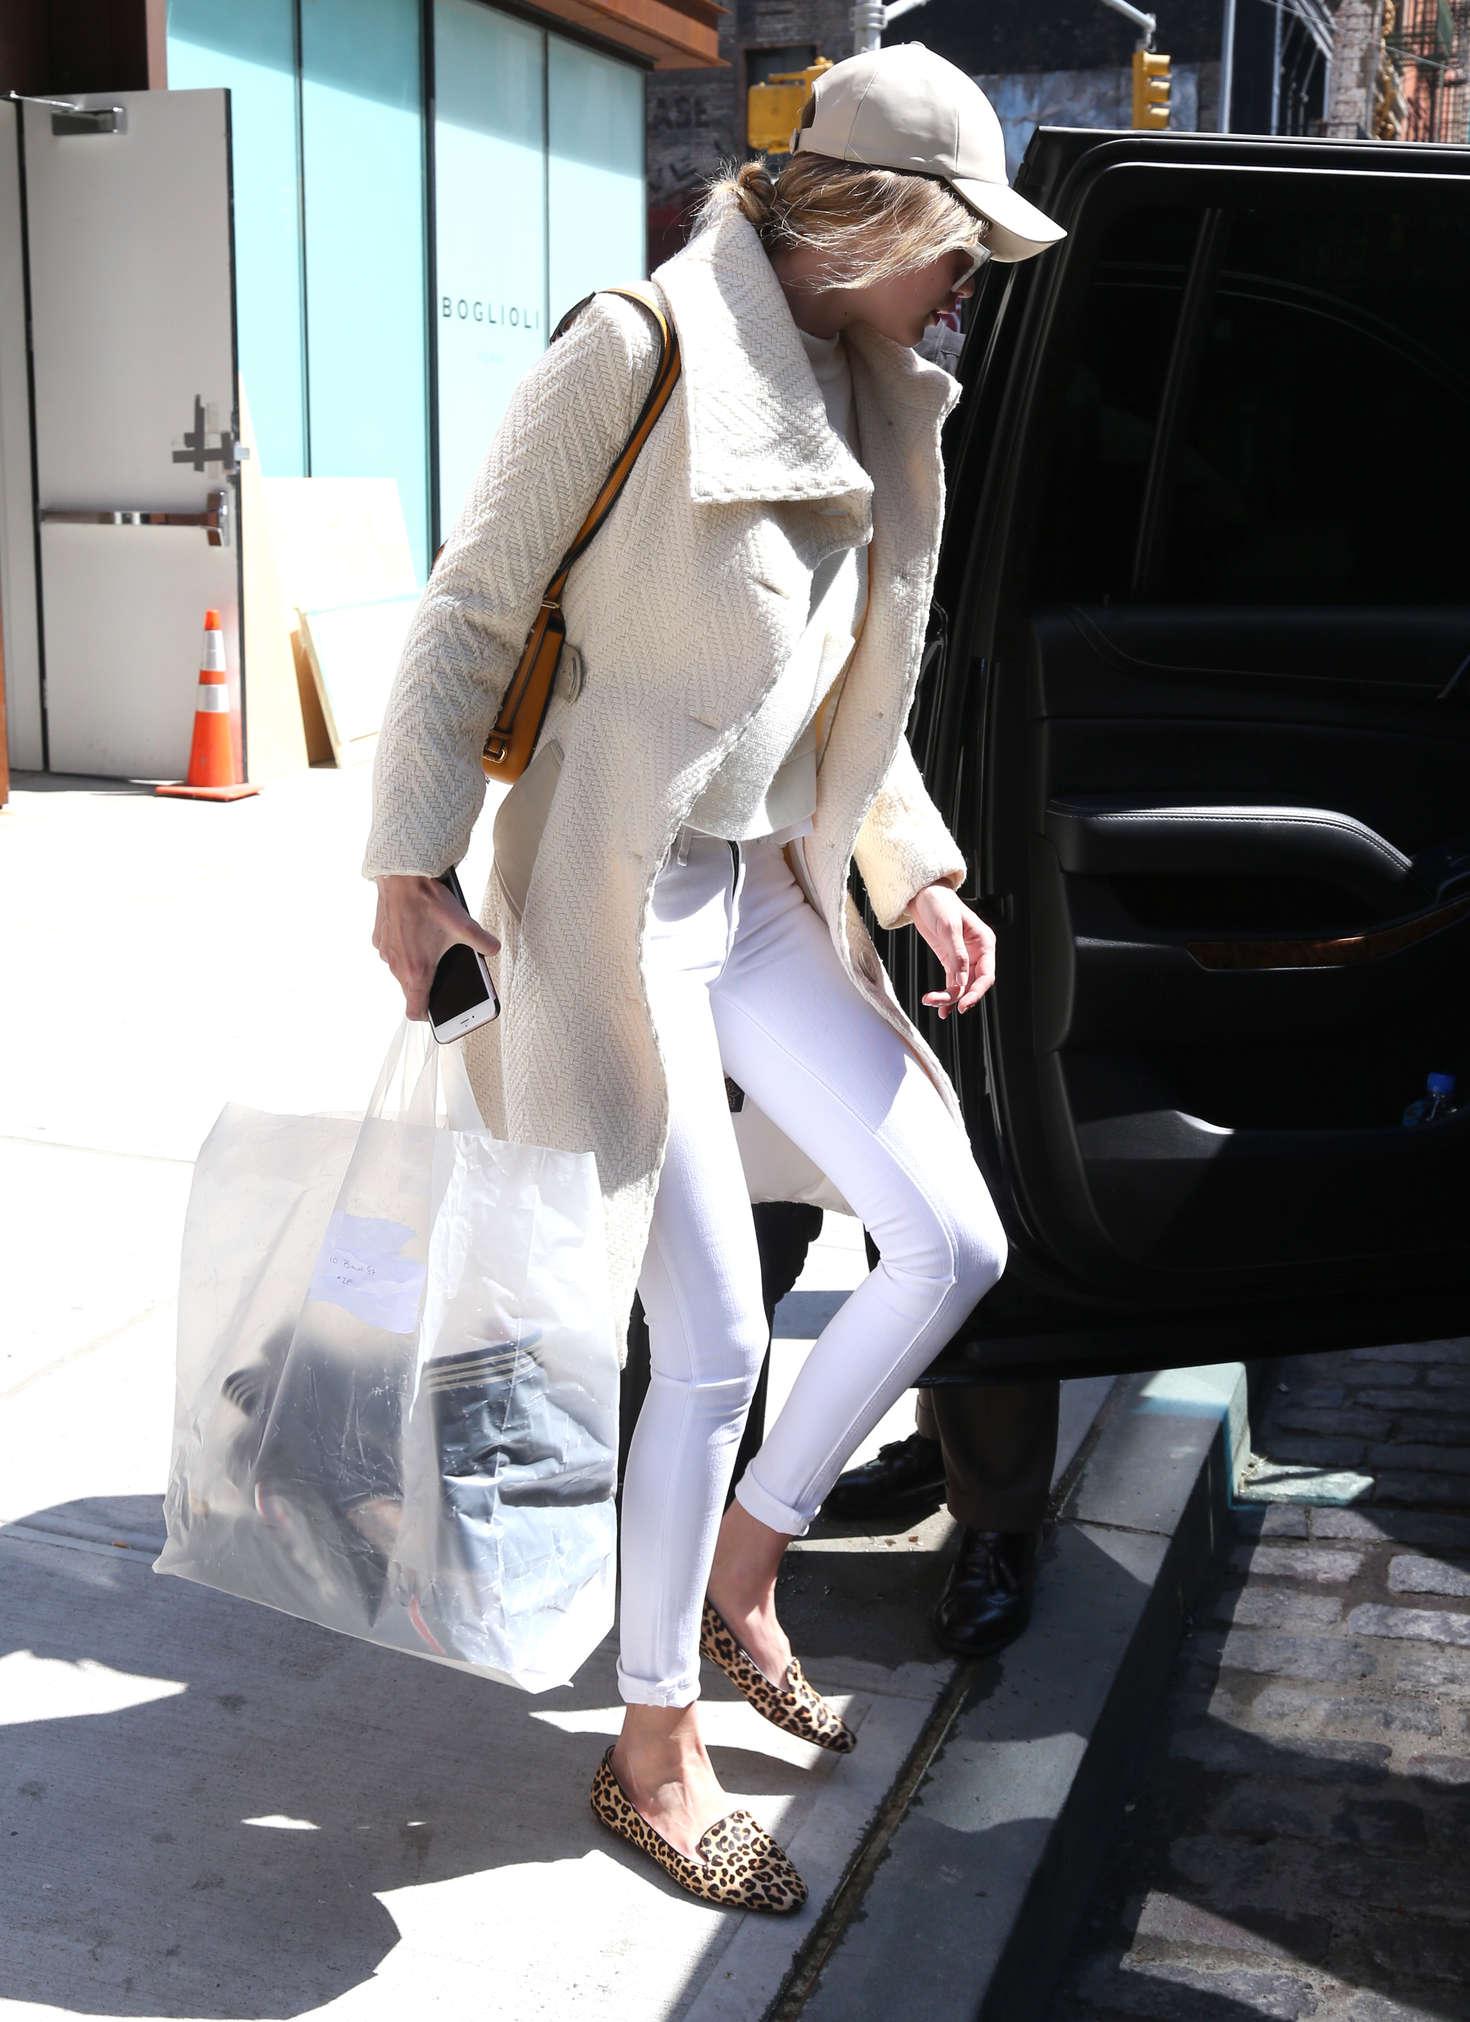 Gigi Hadid Leaving Her Apartment 36 Gotceleb Inside Flats Khaky 40 Full Size